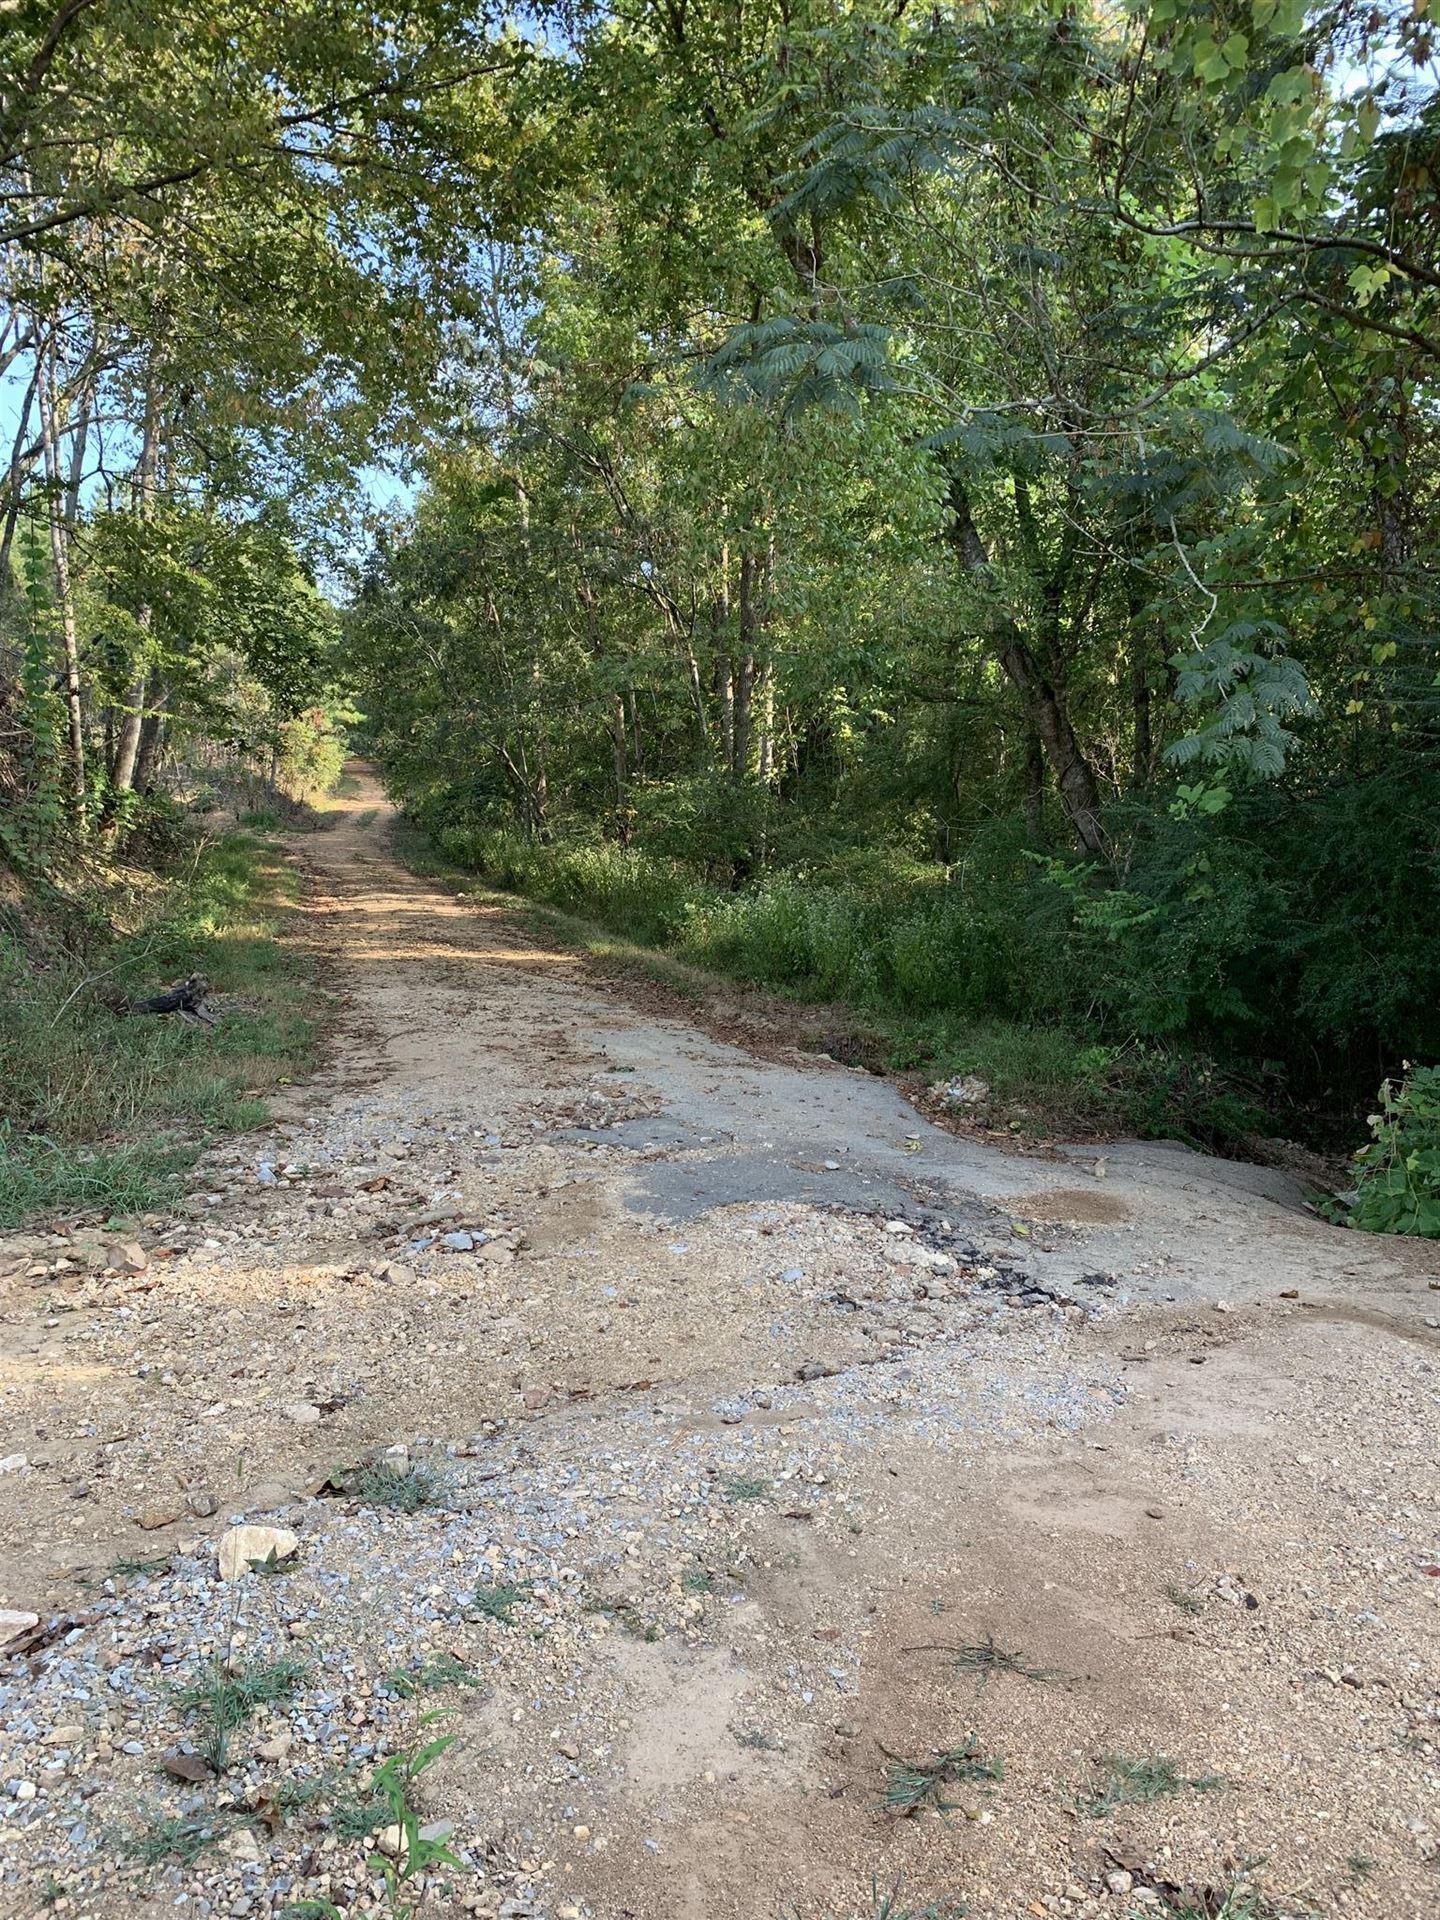 Photo of 0 Gregg St, Lawrenceburg, TN 38464 (MLS # 2086466)